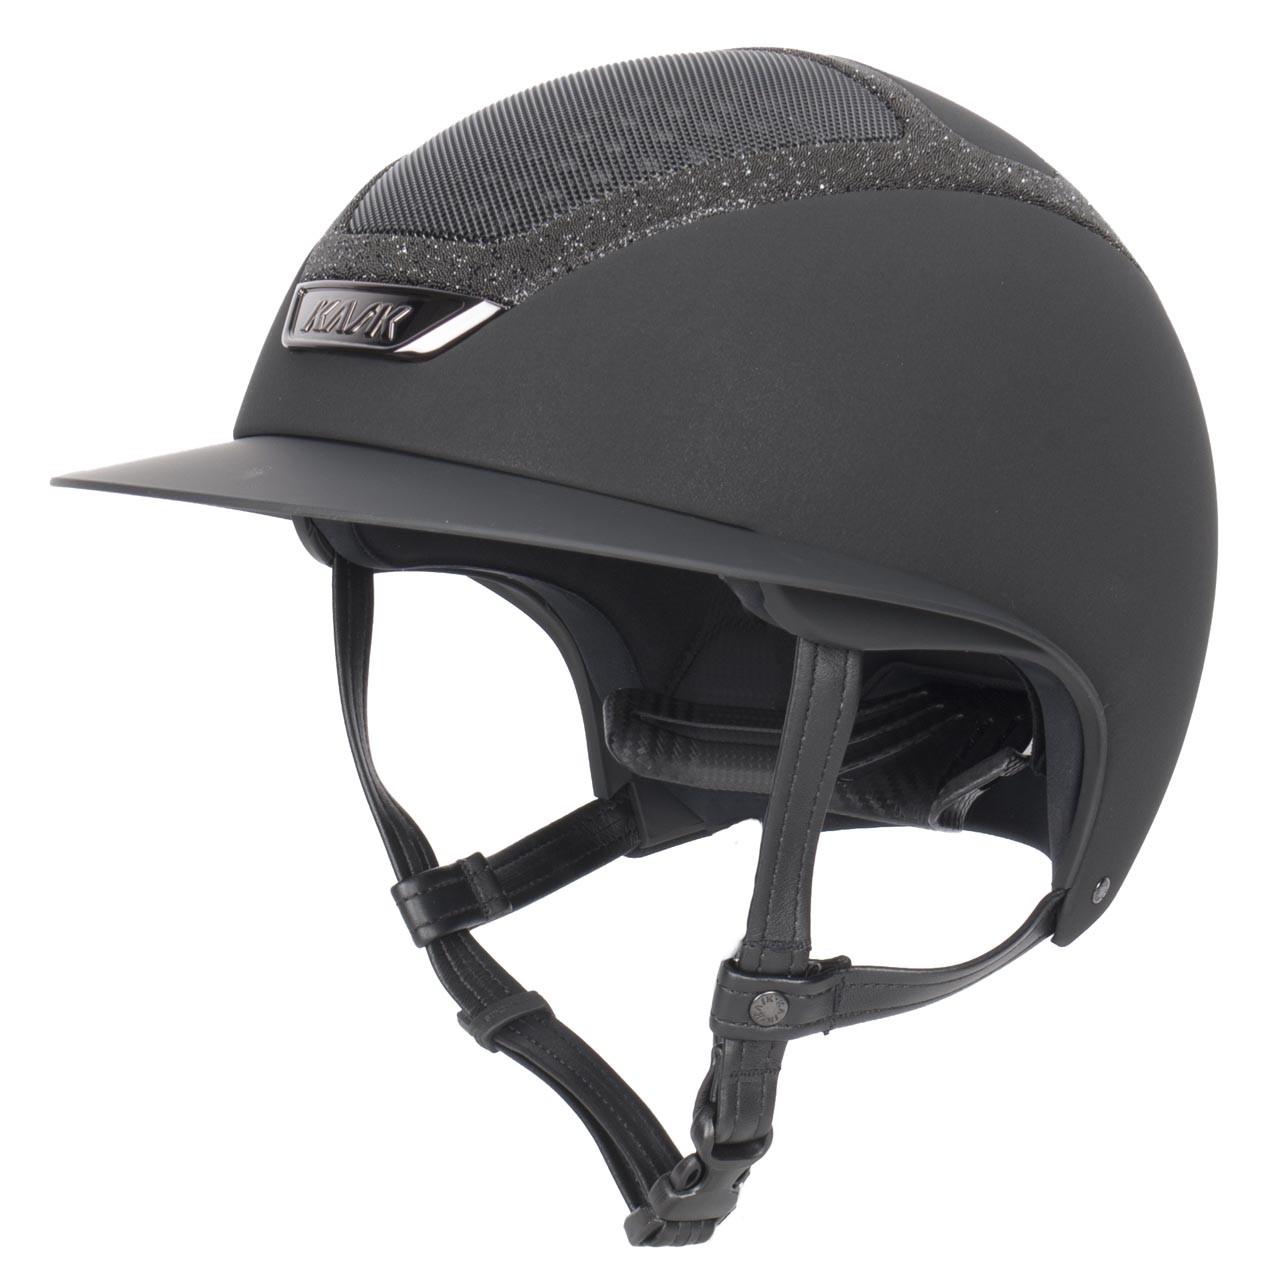 Kask Star Lady Swarovski cap zwart maat:57